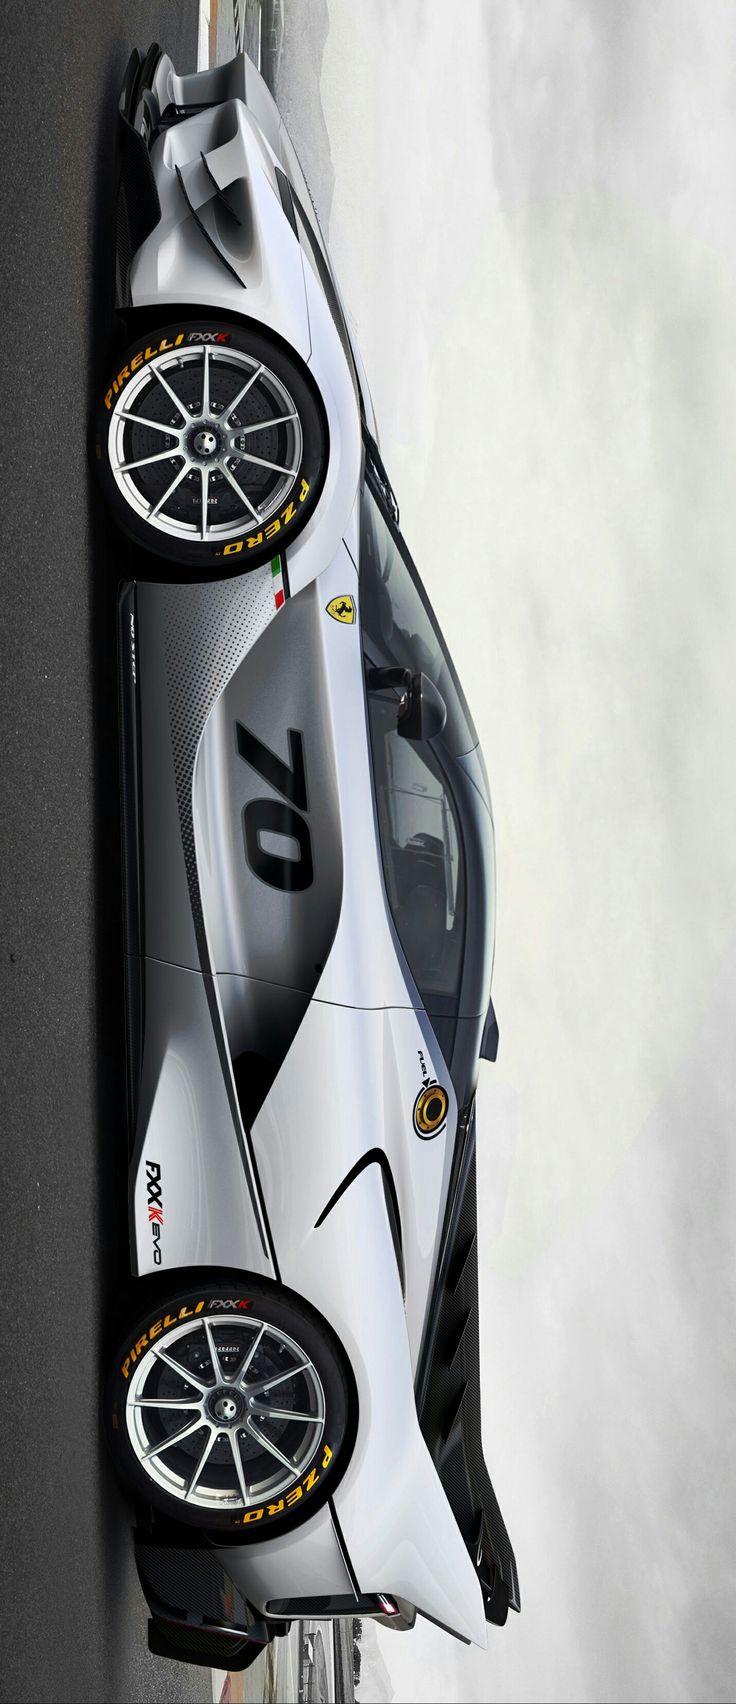 (°!°) 2018 Ferrari FXX-K Evo Fosterginger.Pinterest.ComMore Pins Like This One At FOSTERGINGER @ PINTEREST No Pin Limitsでこのようなピンがいっぱいになるピンの限界